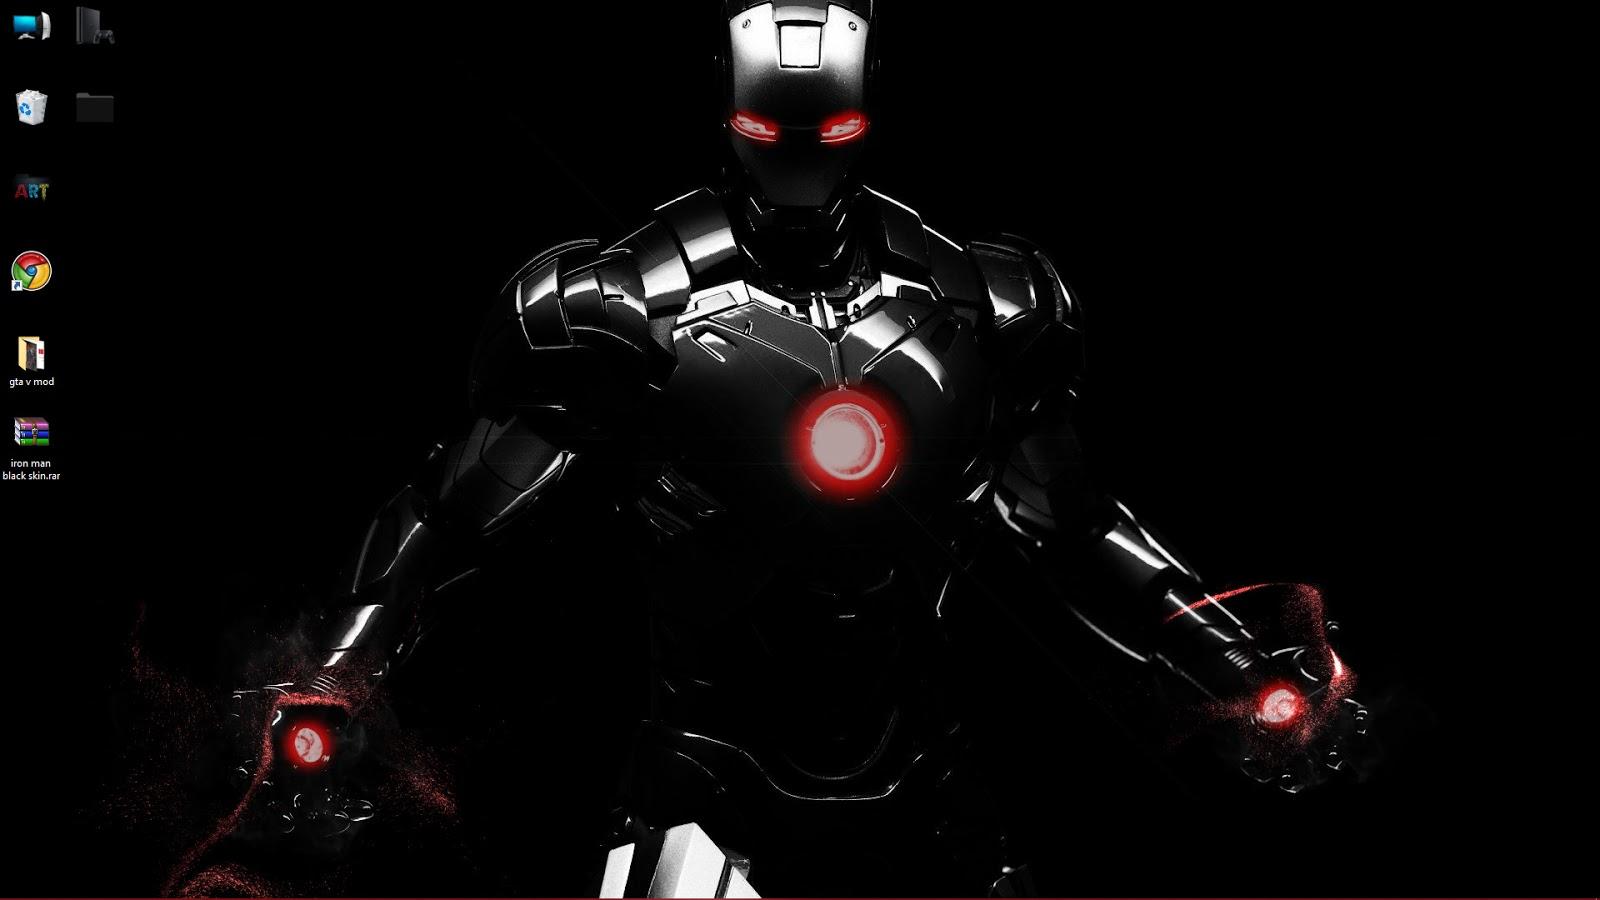 iron man live wallpaper free download - wallpaper engine